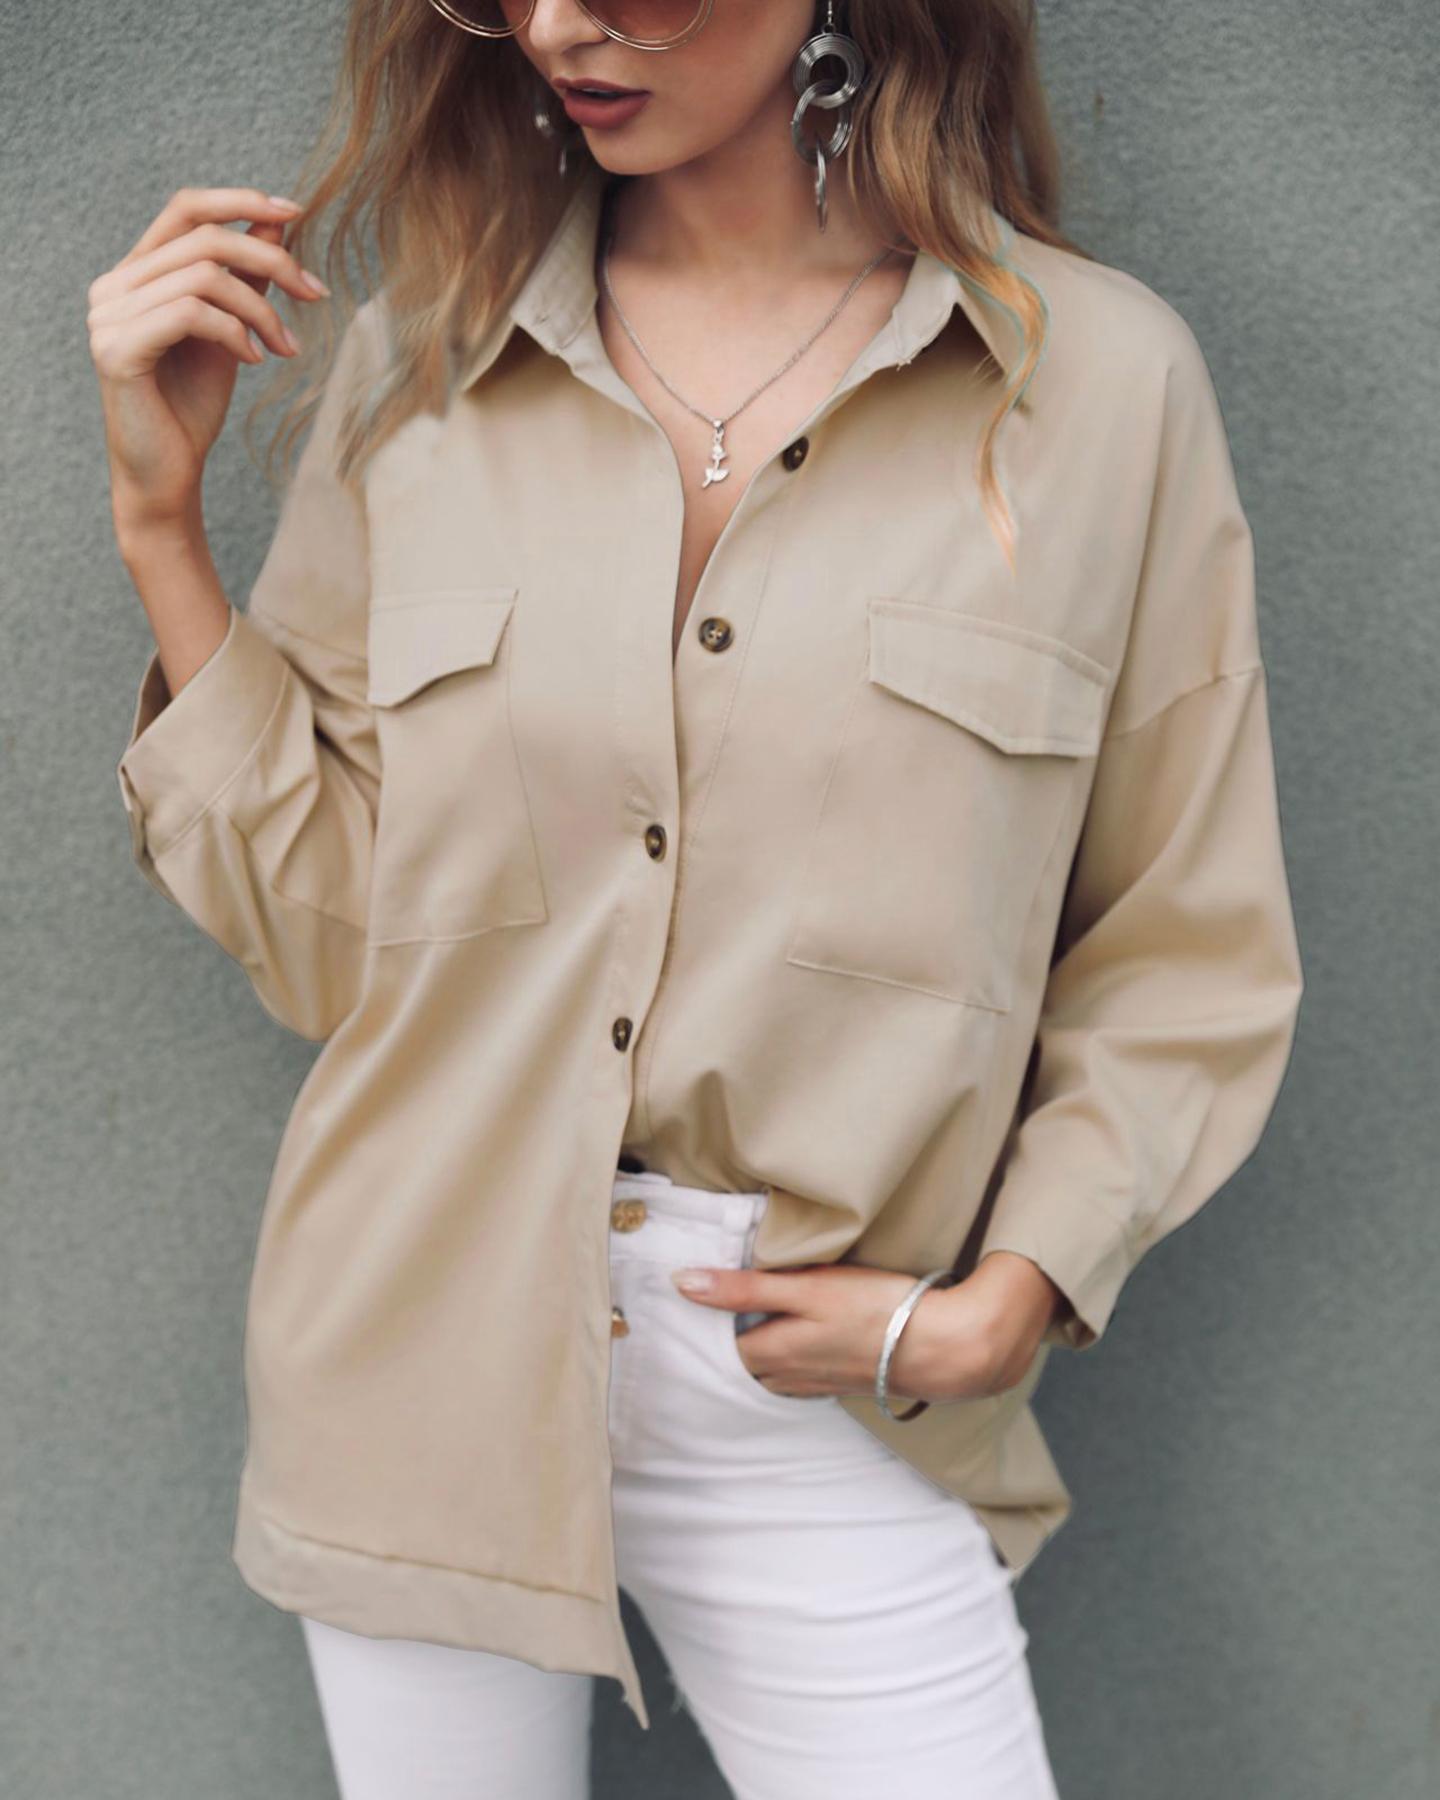 chicme / Camisa casual de manga larga con bolsillo sólido